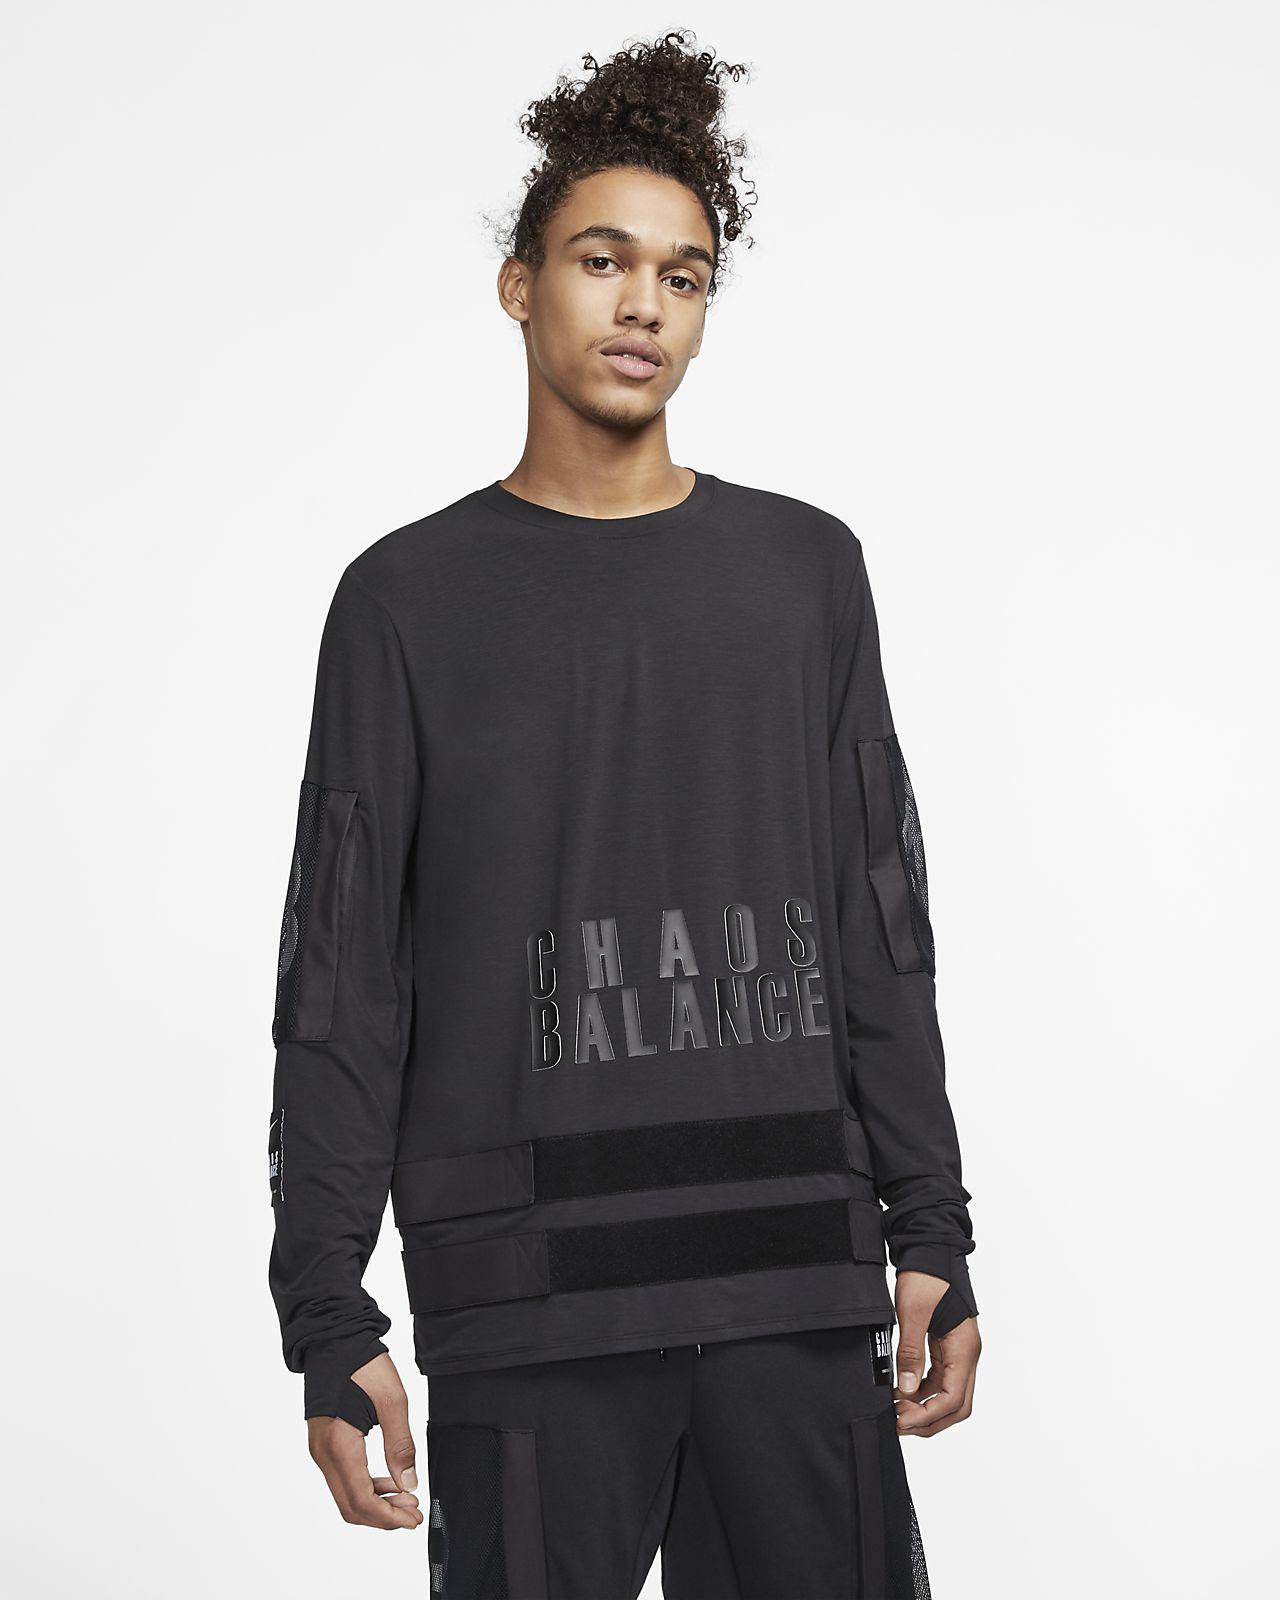 Långärmad tröja Nike x Undercover för män